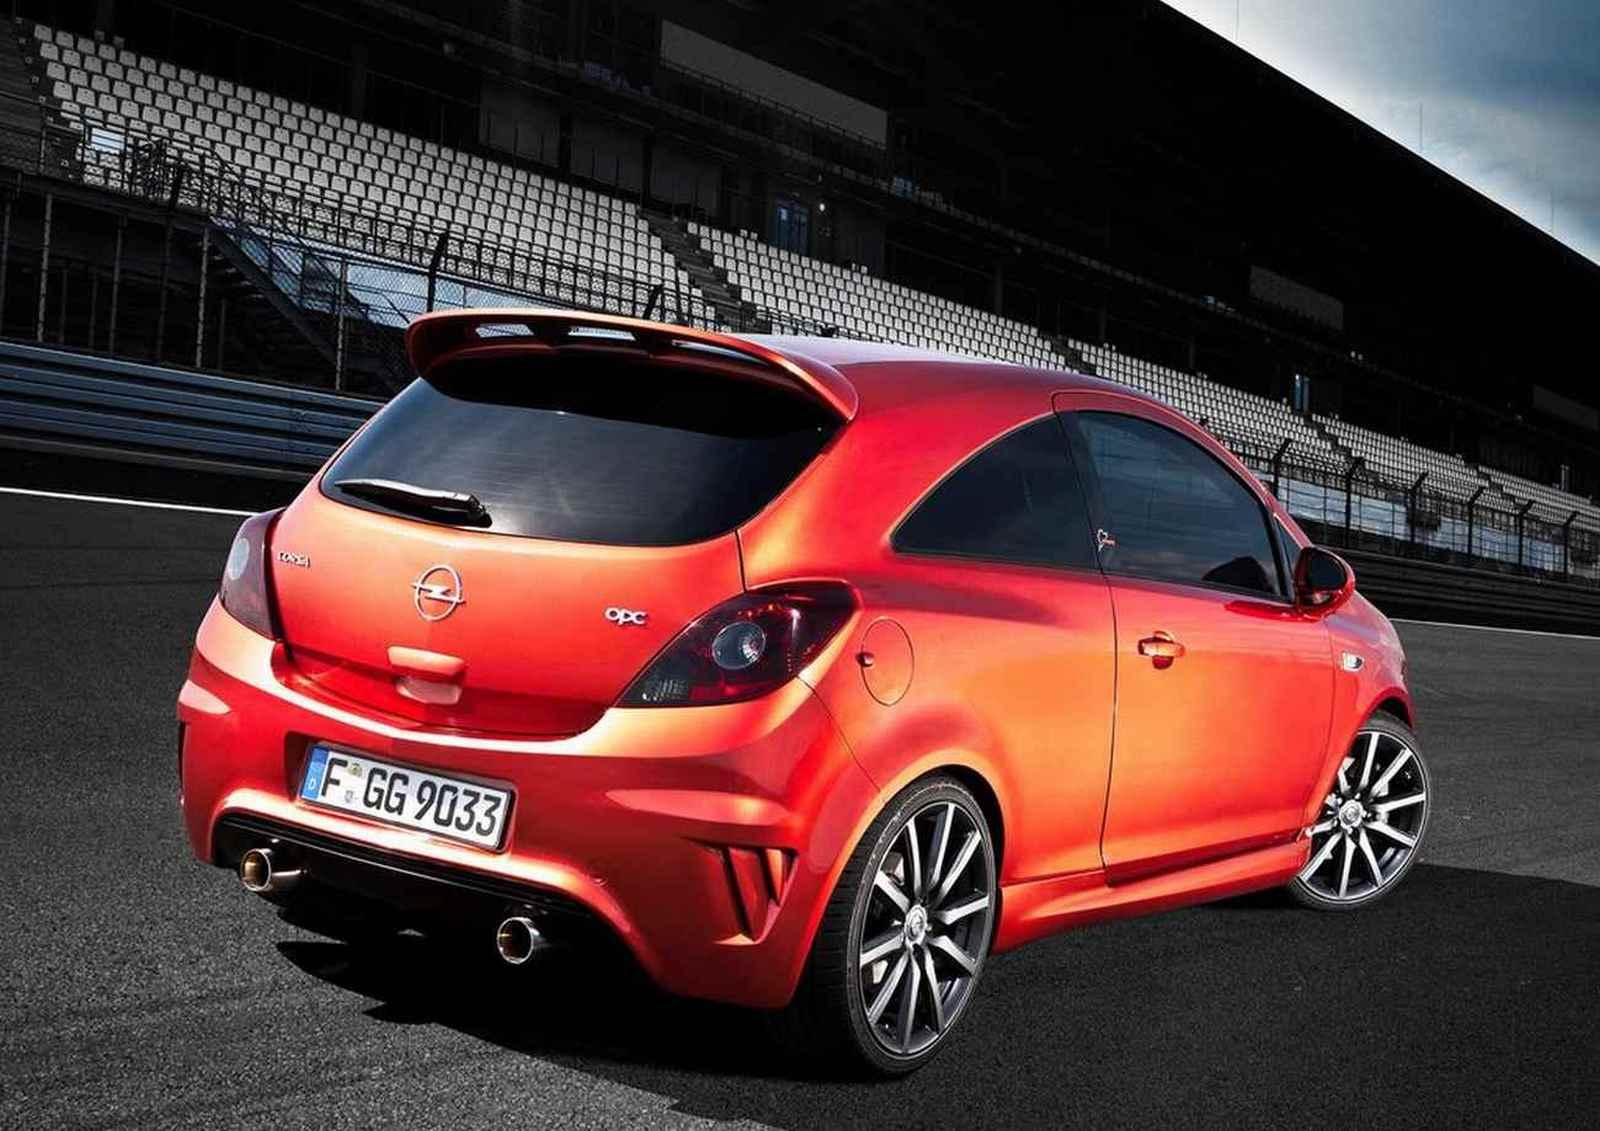 Carsautomotive: Opel Corsa OPC Nurburgring Edition 2011